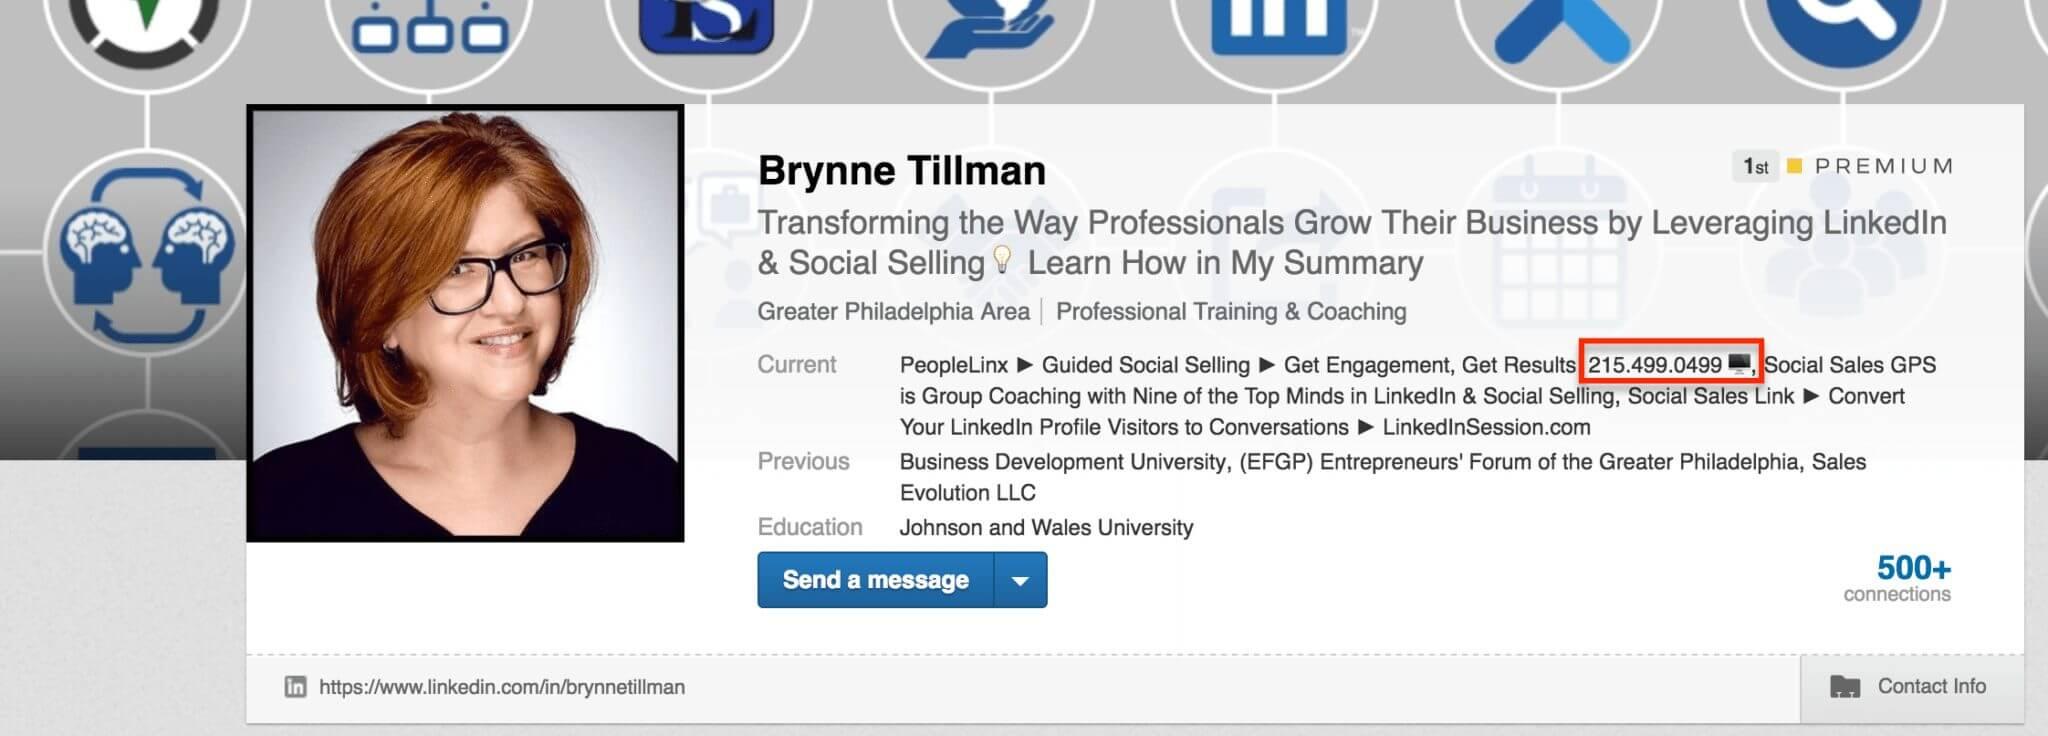 Brynne Tillman LinkedIn Bio